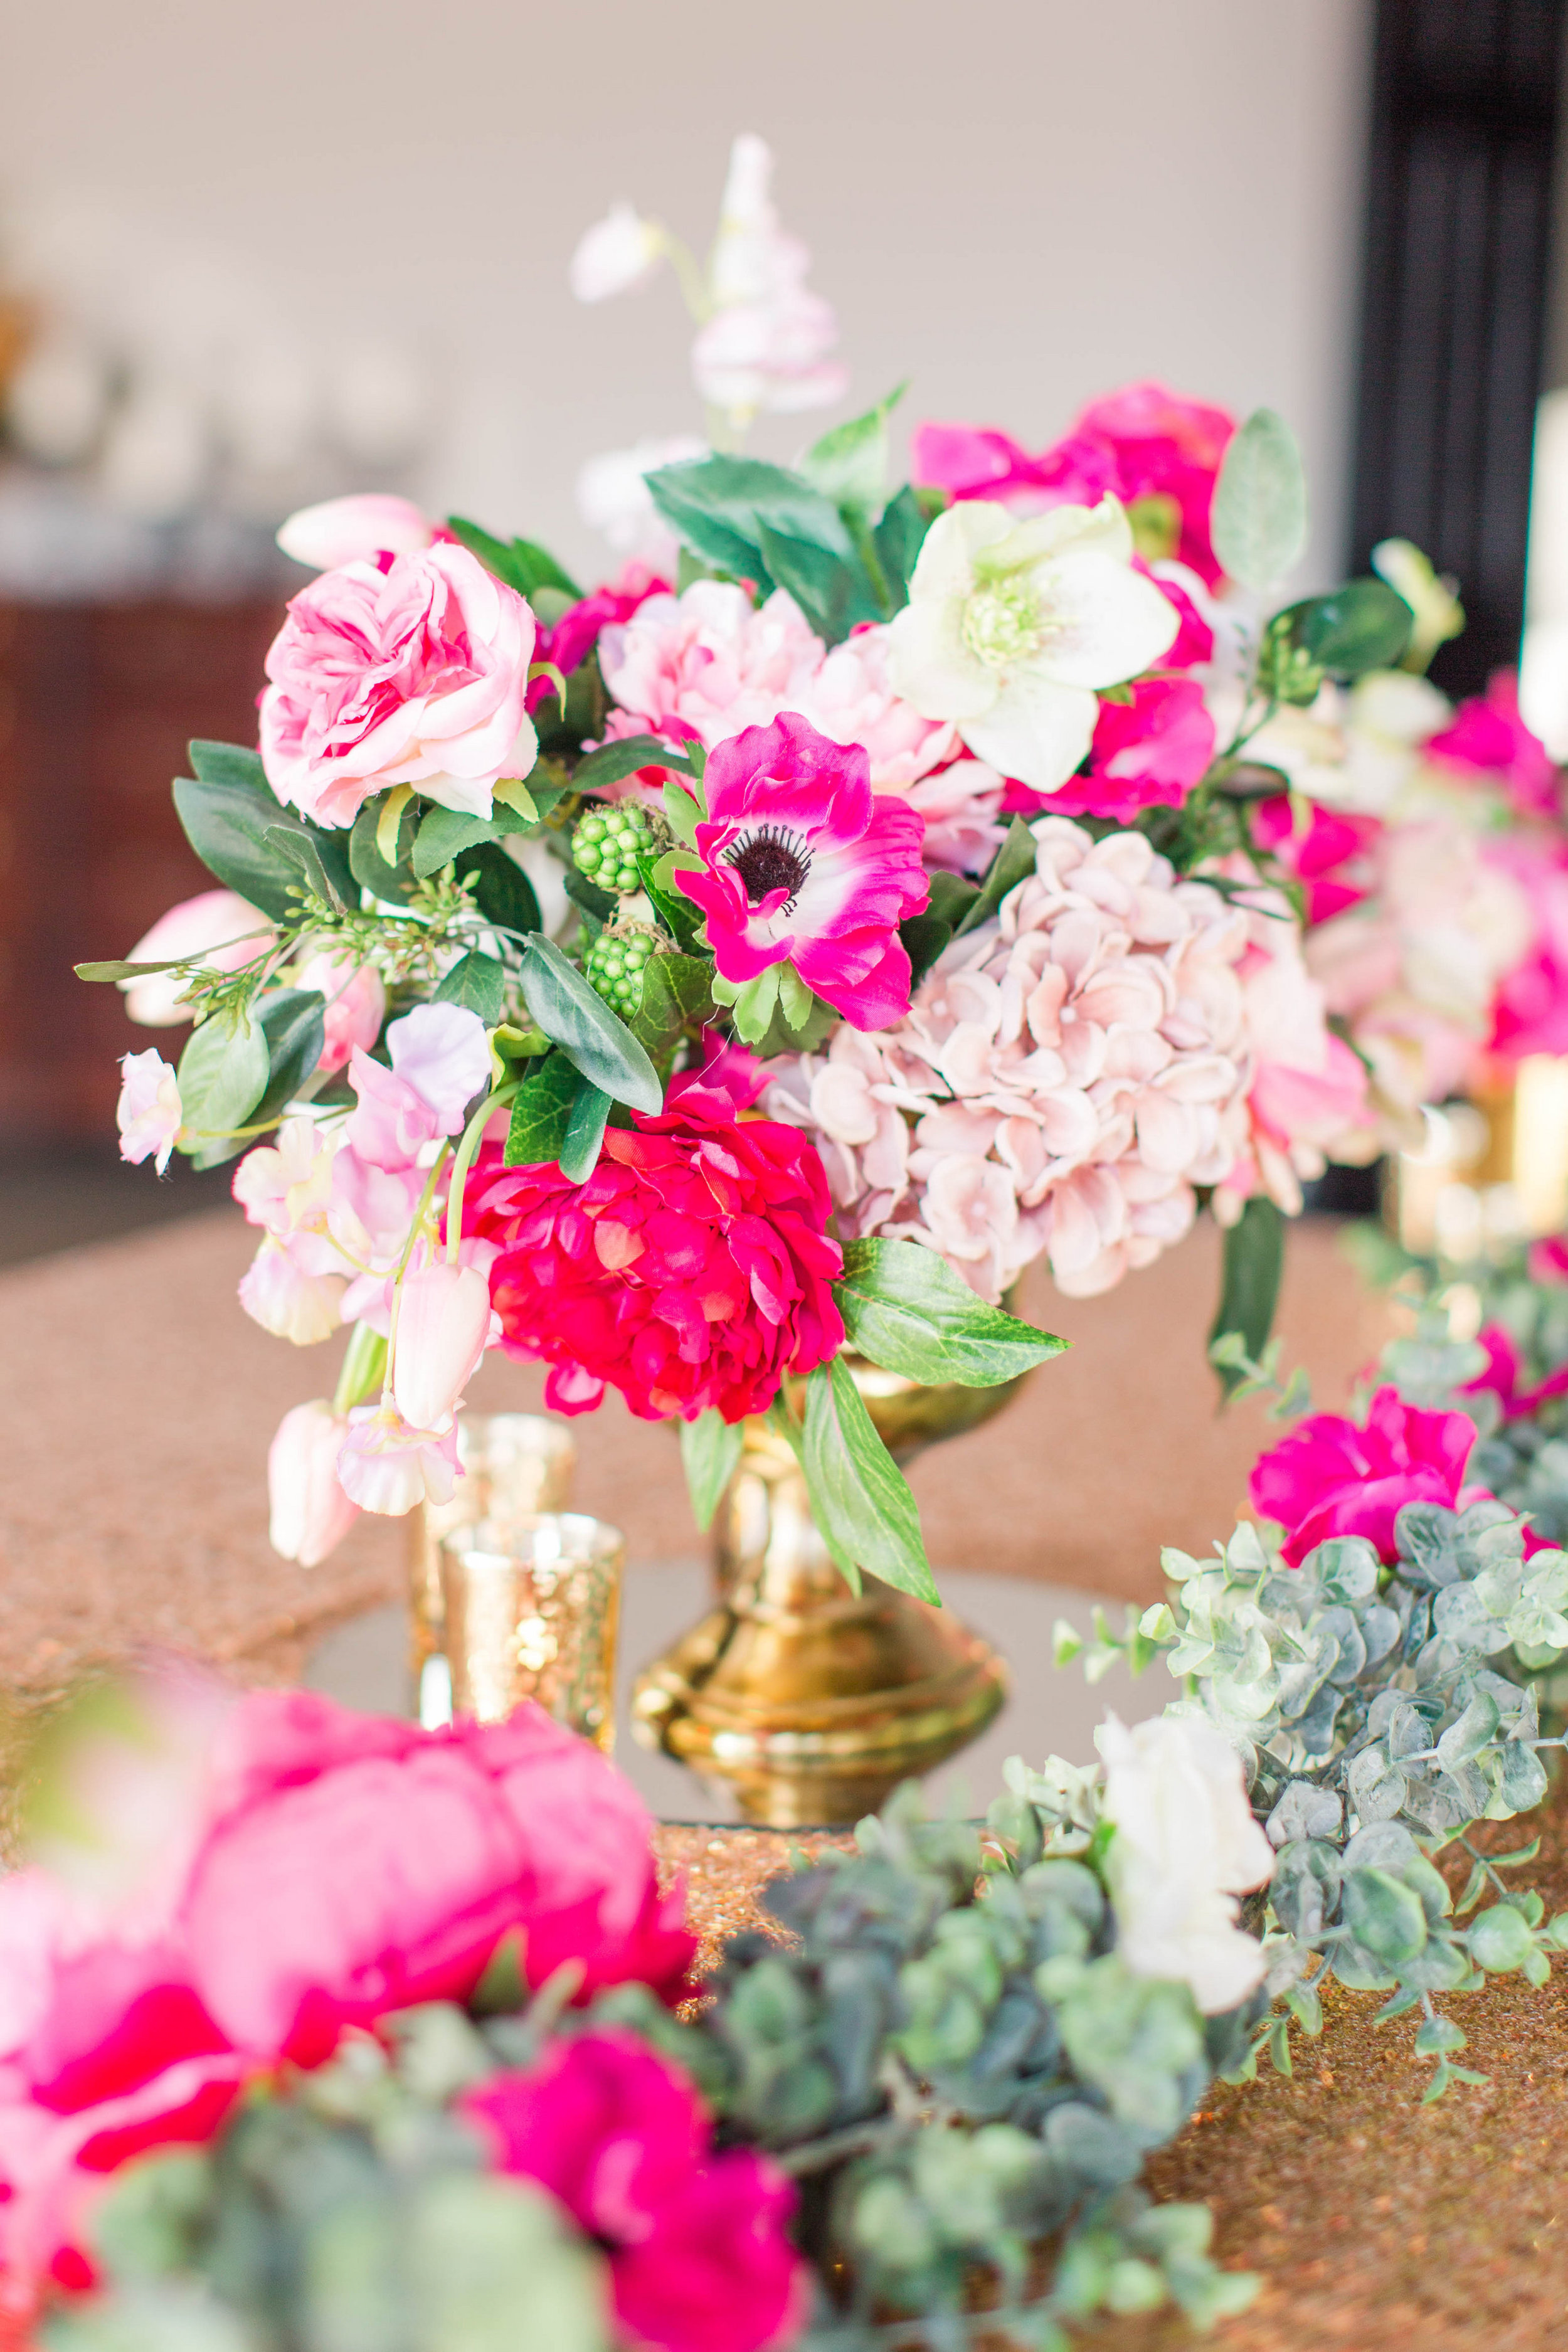 afloral-fake-flower-wedding-ivory-and-beau-bridal-boutique-maggie-sottero-saffron-the-hall-on-vine-wedding-statesboro-wedding-savannah-wedding-kristian-designs-rachel-strickland-photography-savannah-bridal-southern-bride-savannah-bride-21.jpg